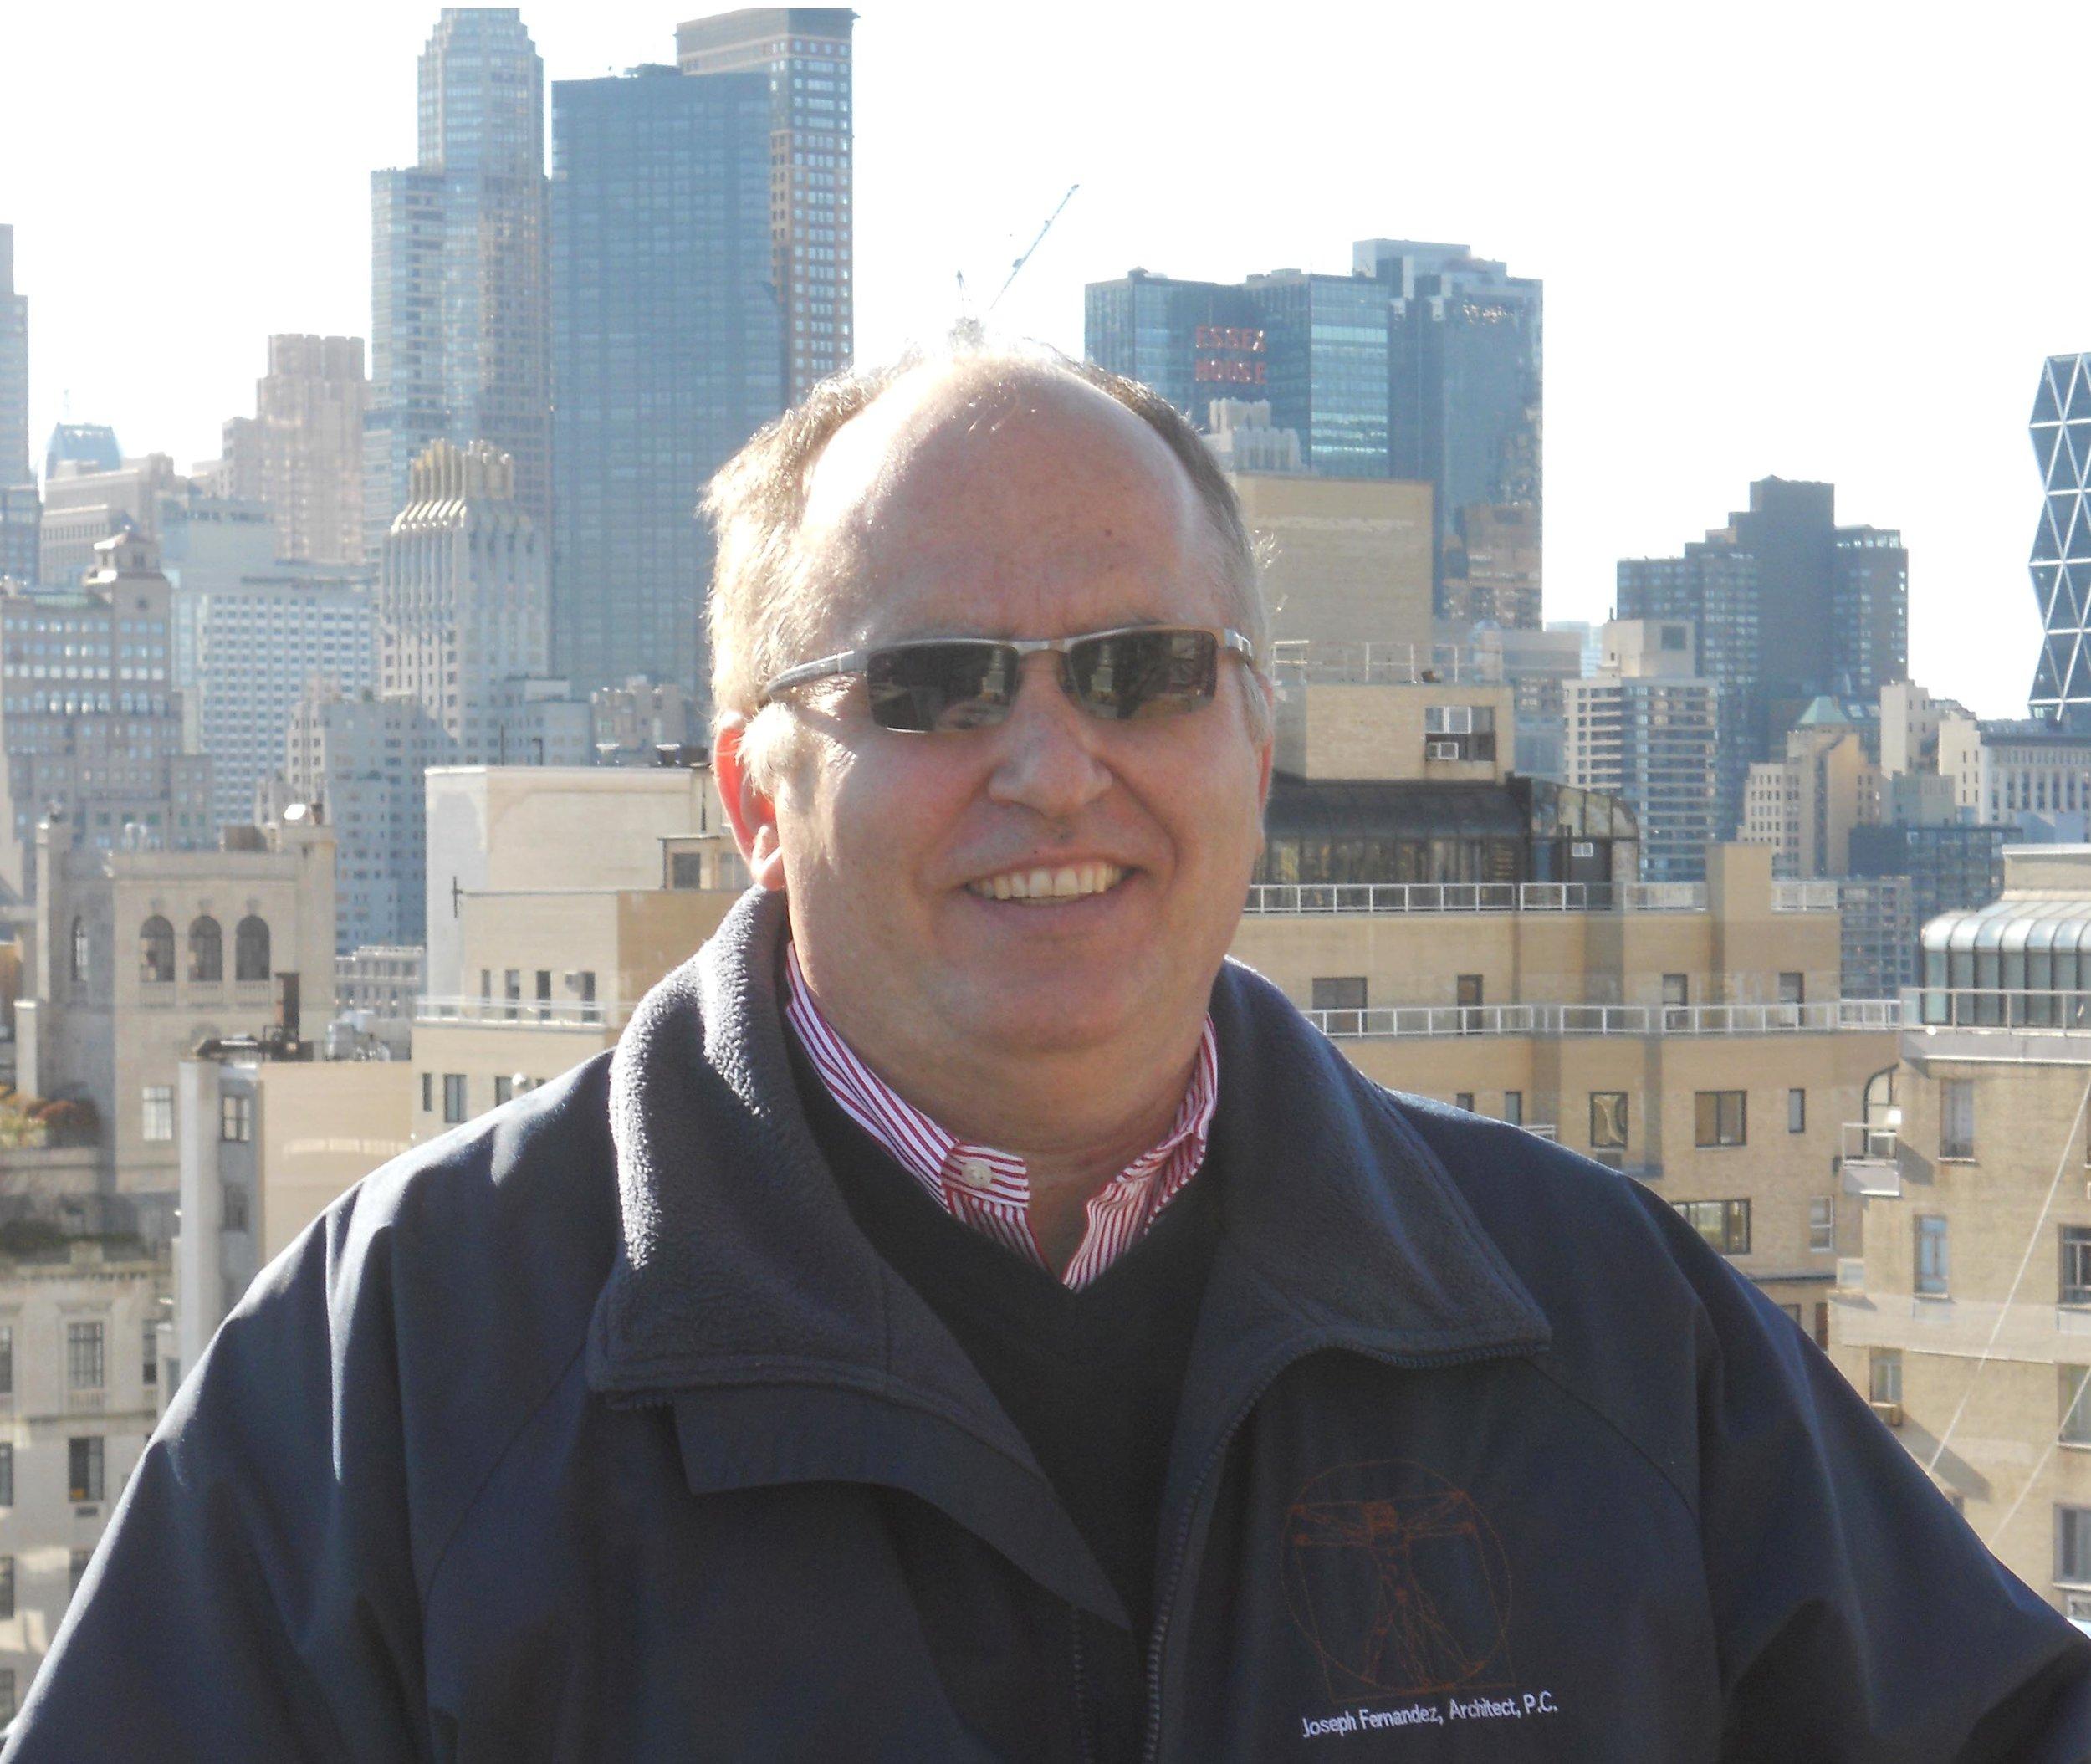 JOE FERNANDEZ  | NCARB,AIA, CEO